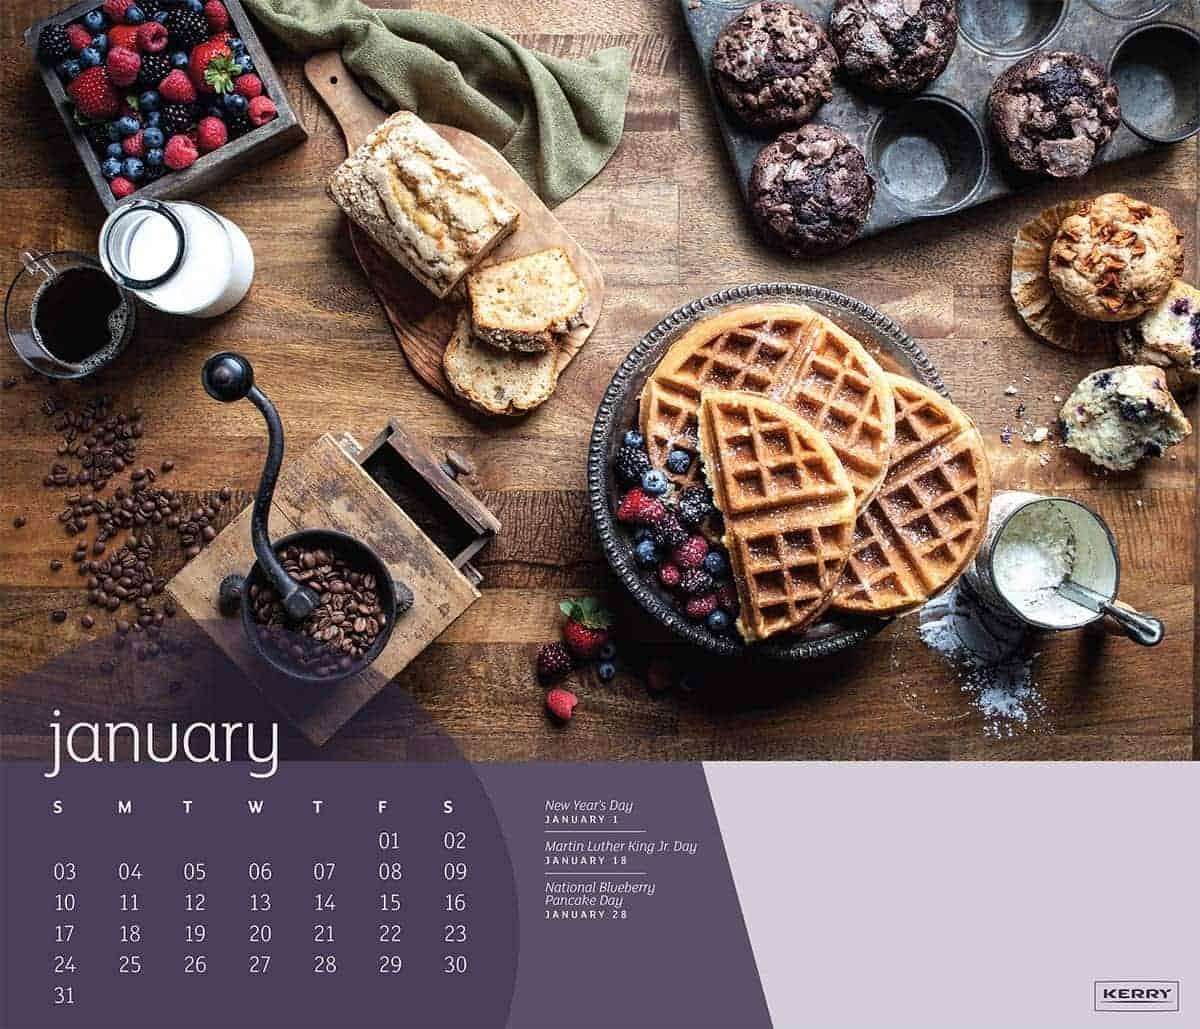 2016 Kerry Holiday Calendar_Jena Carlin Photography_96-3